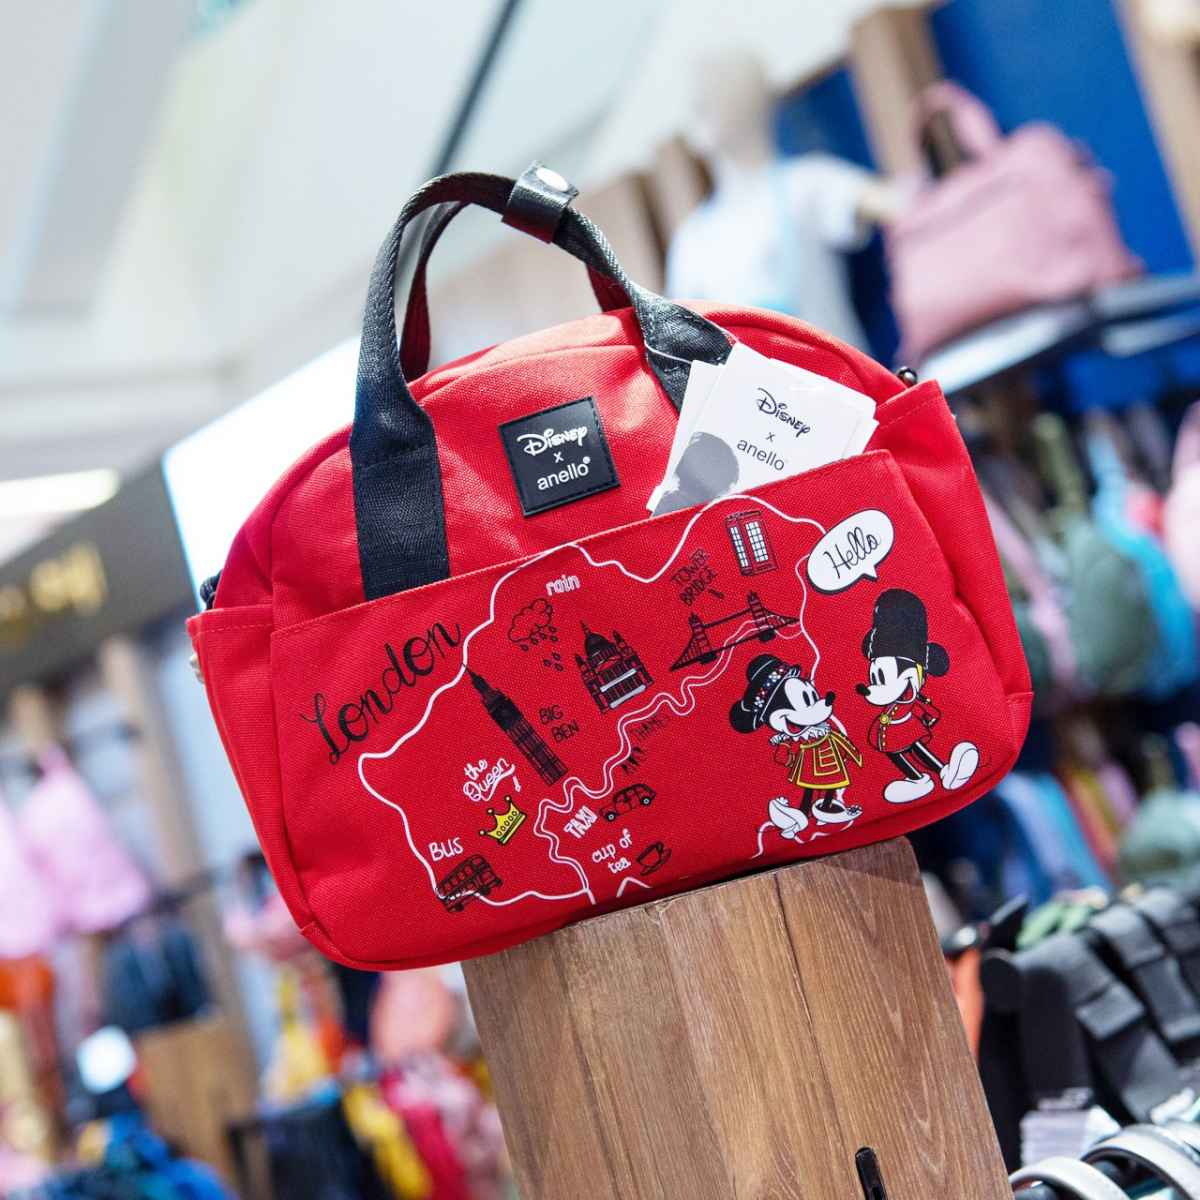 Anello กระเป๋า สีแดง